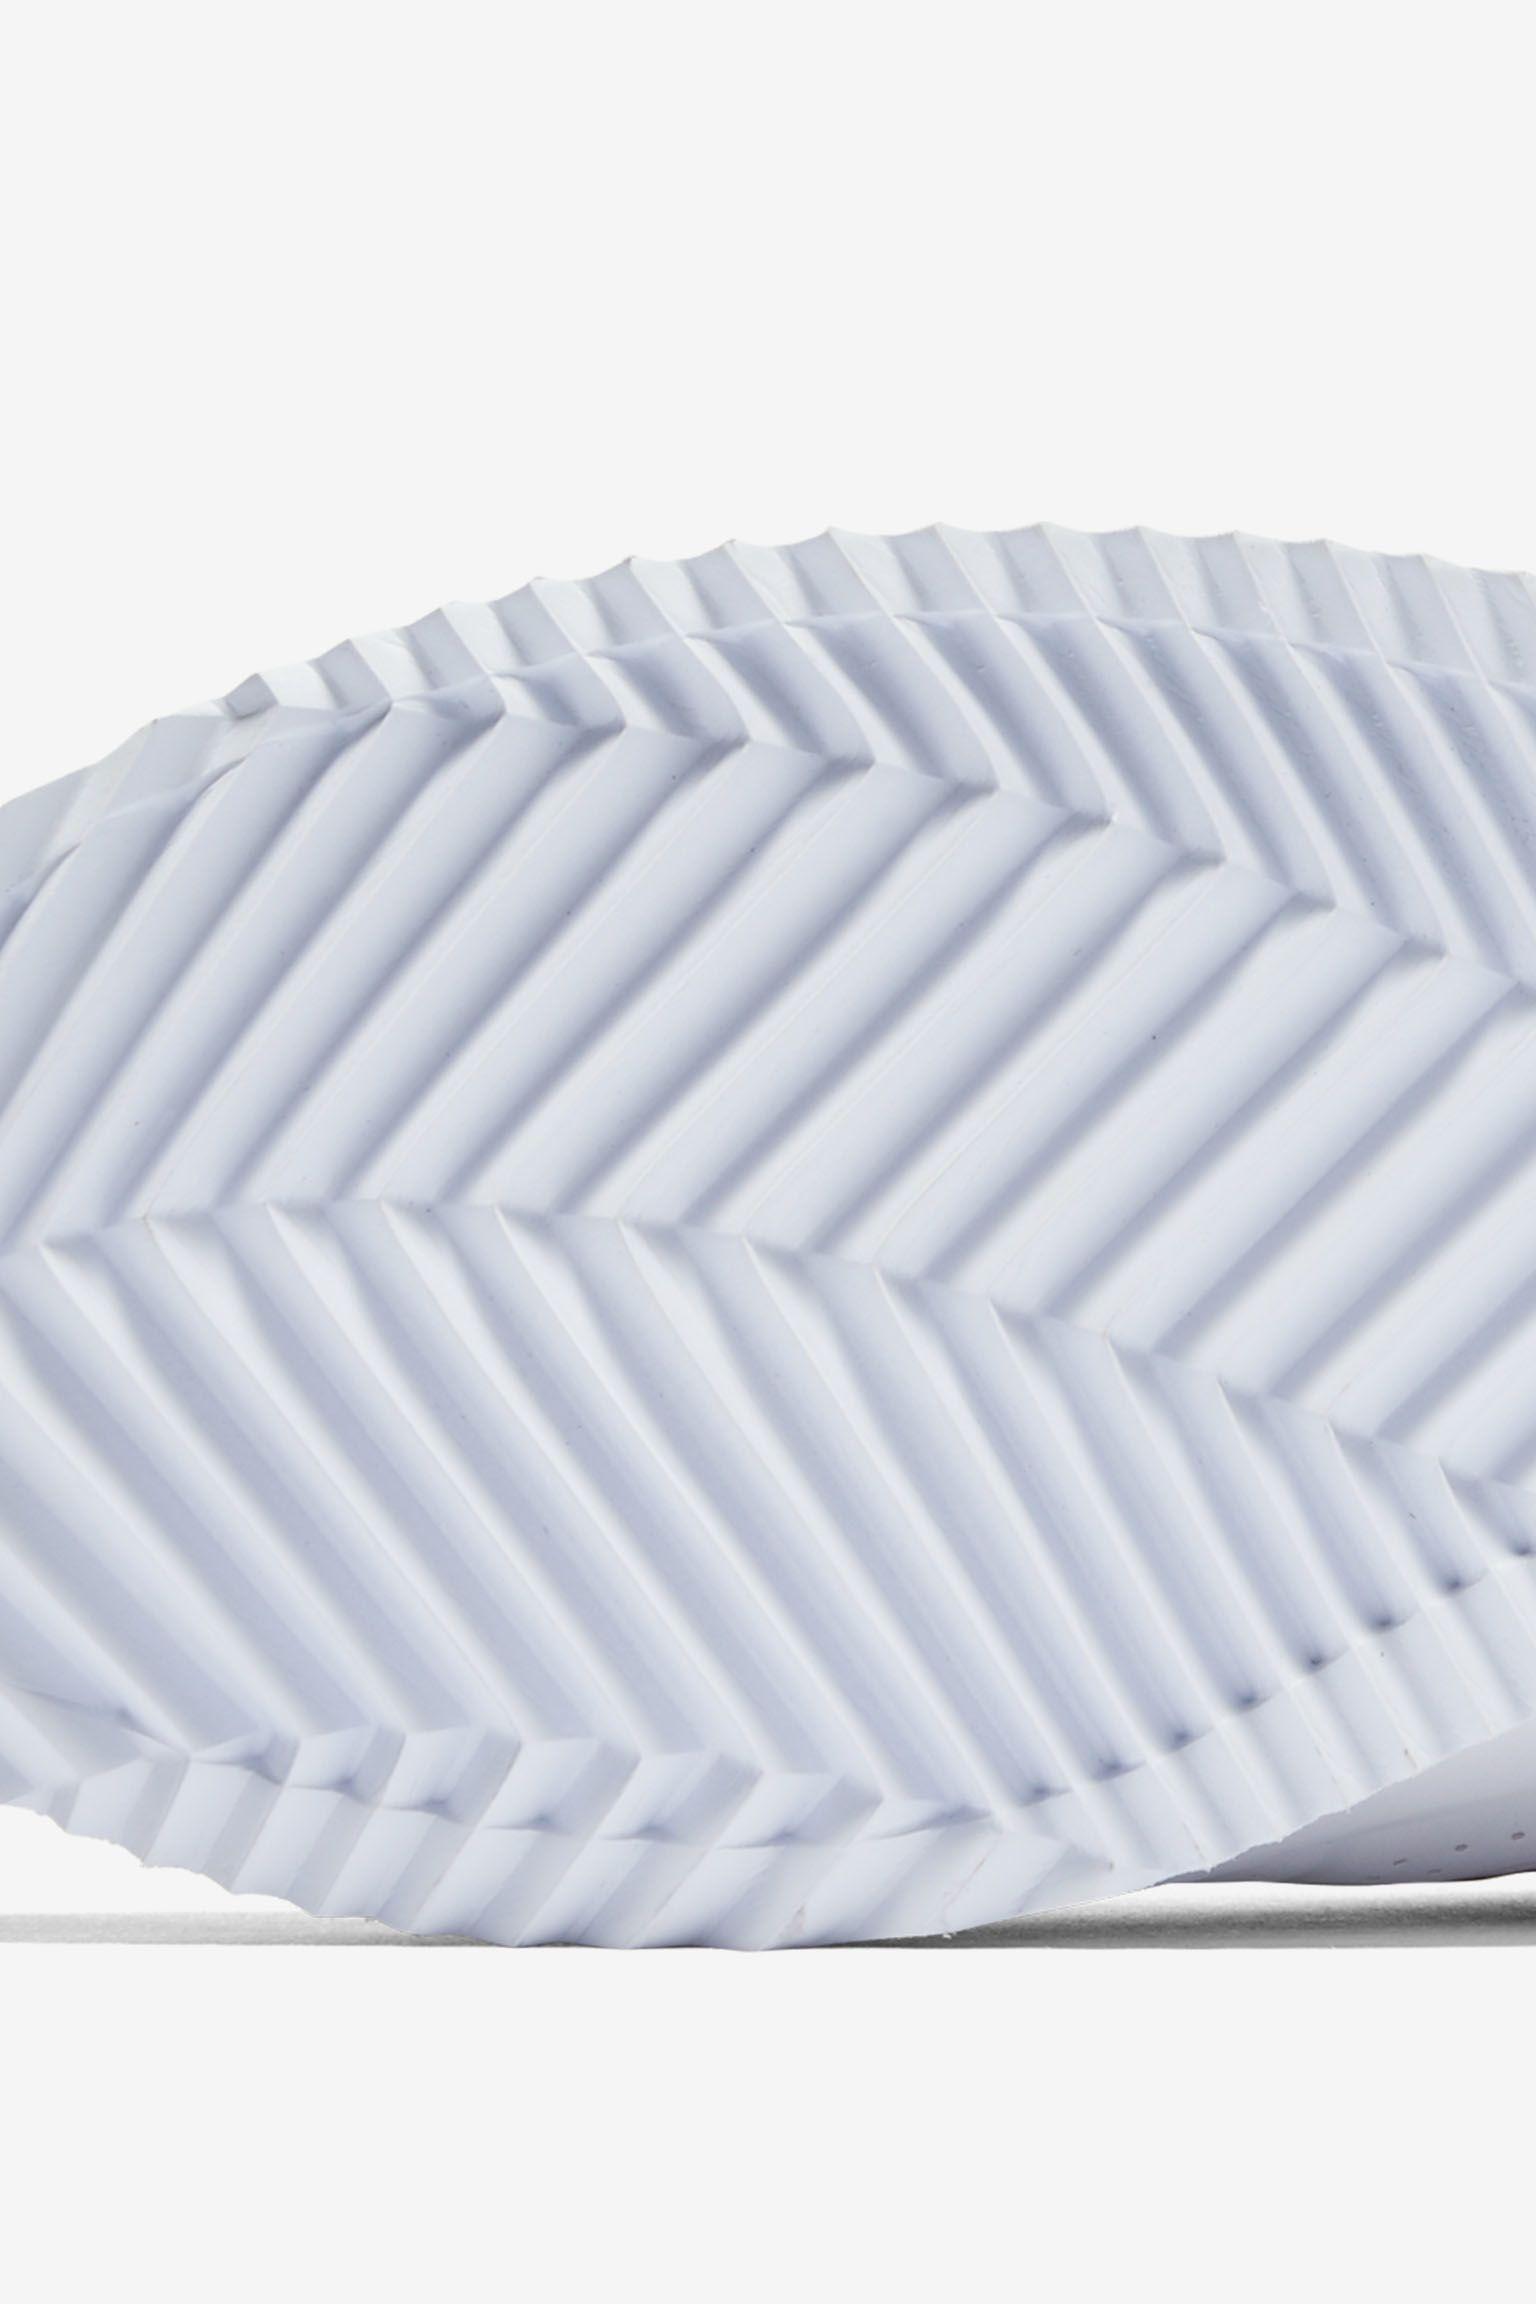 Nike Cortez Ultra Moire 'Forrest Gump'